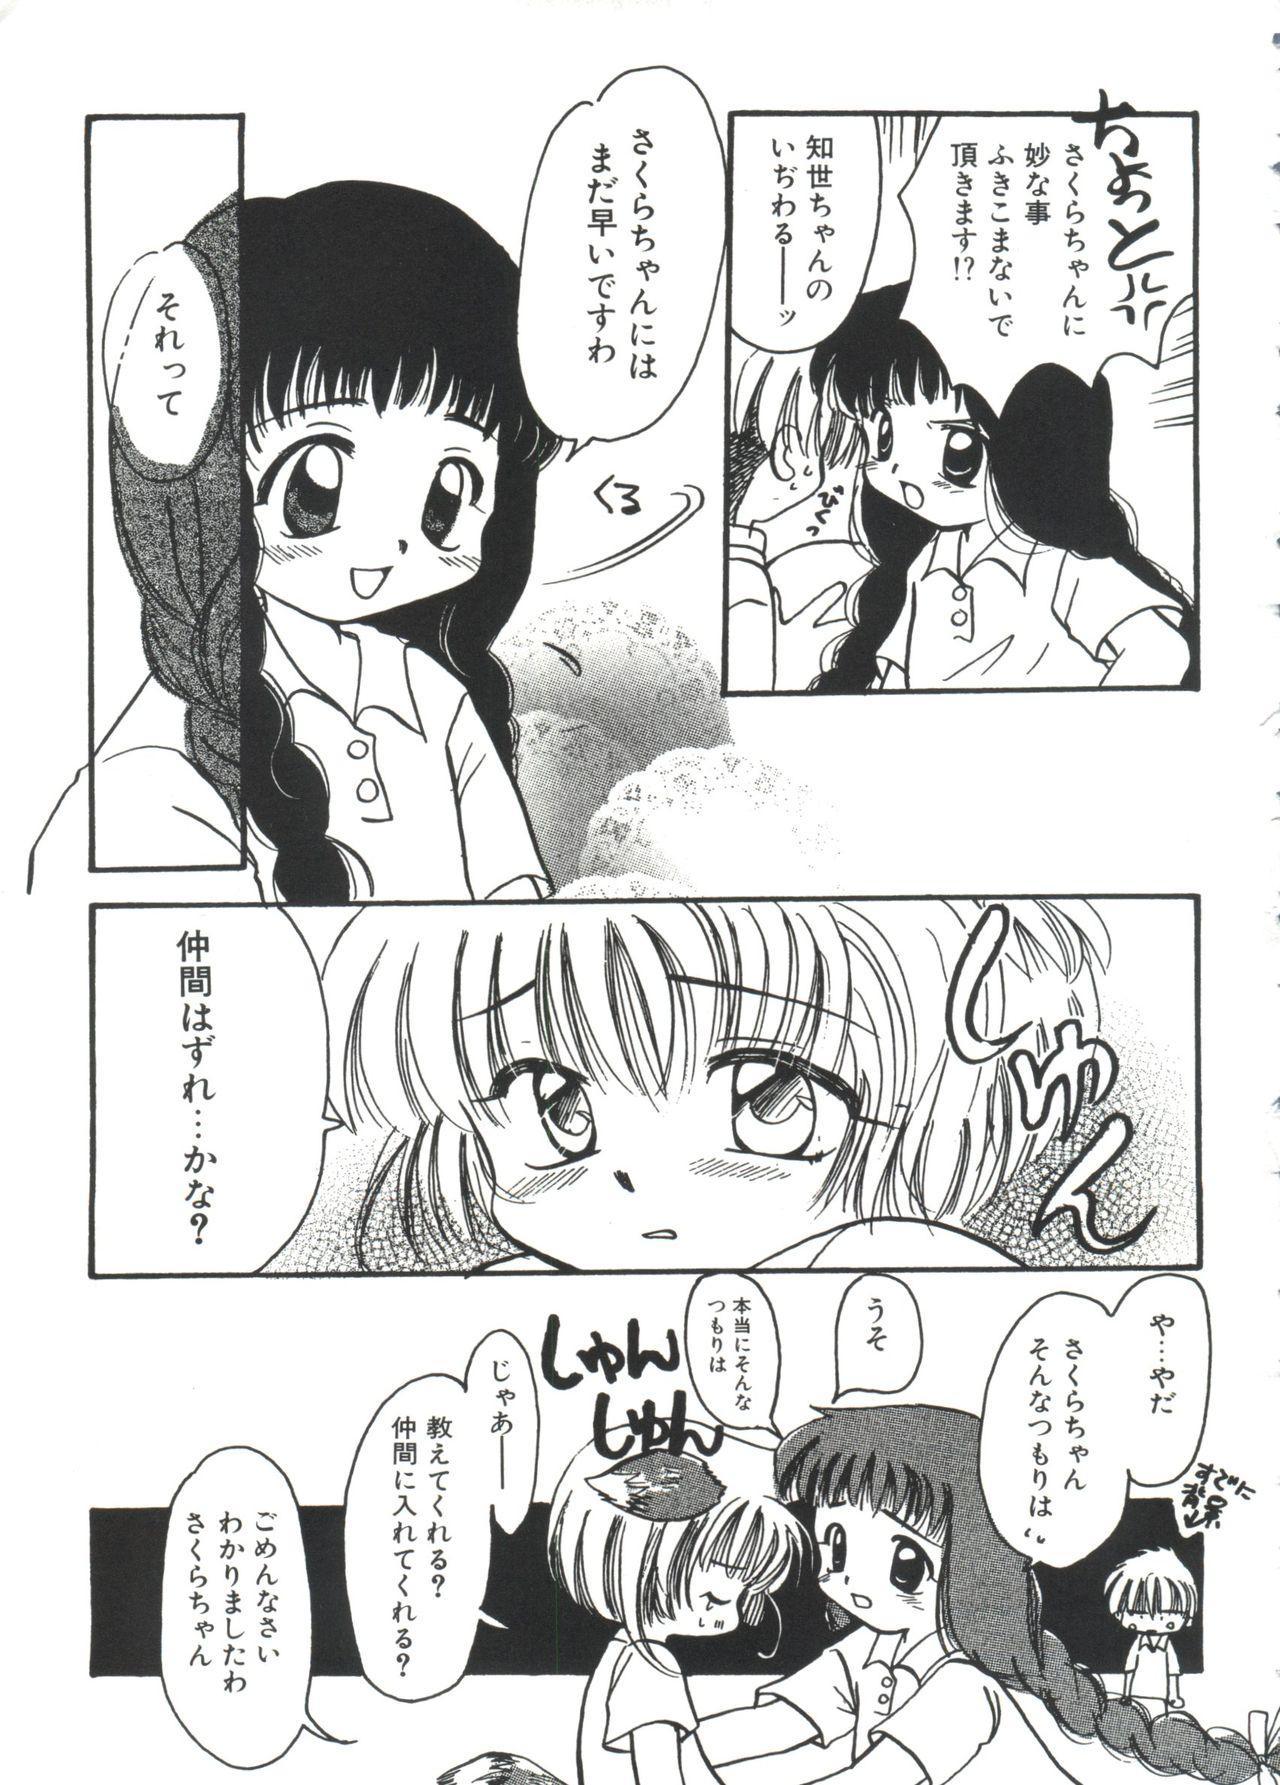 Ero-chan to Issho 2 146